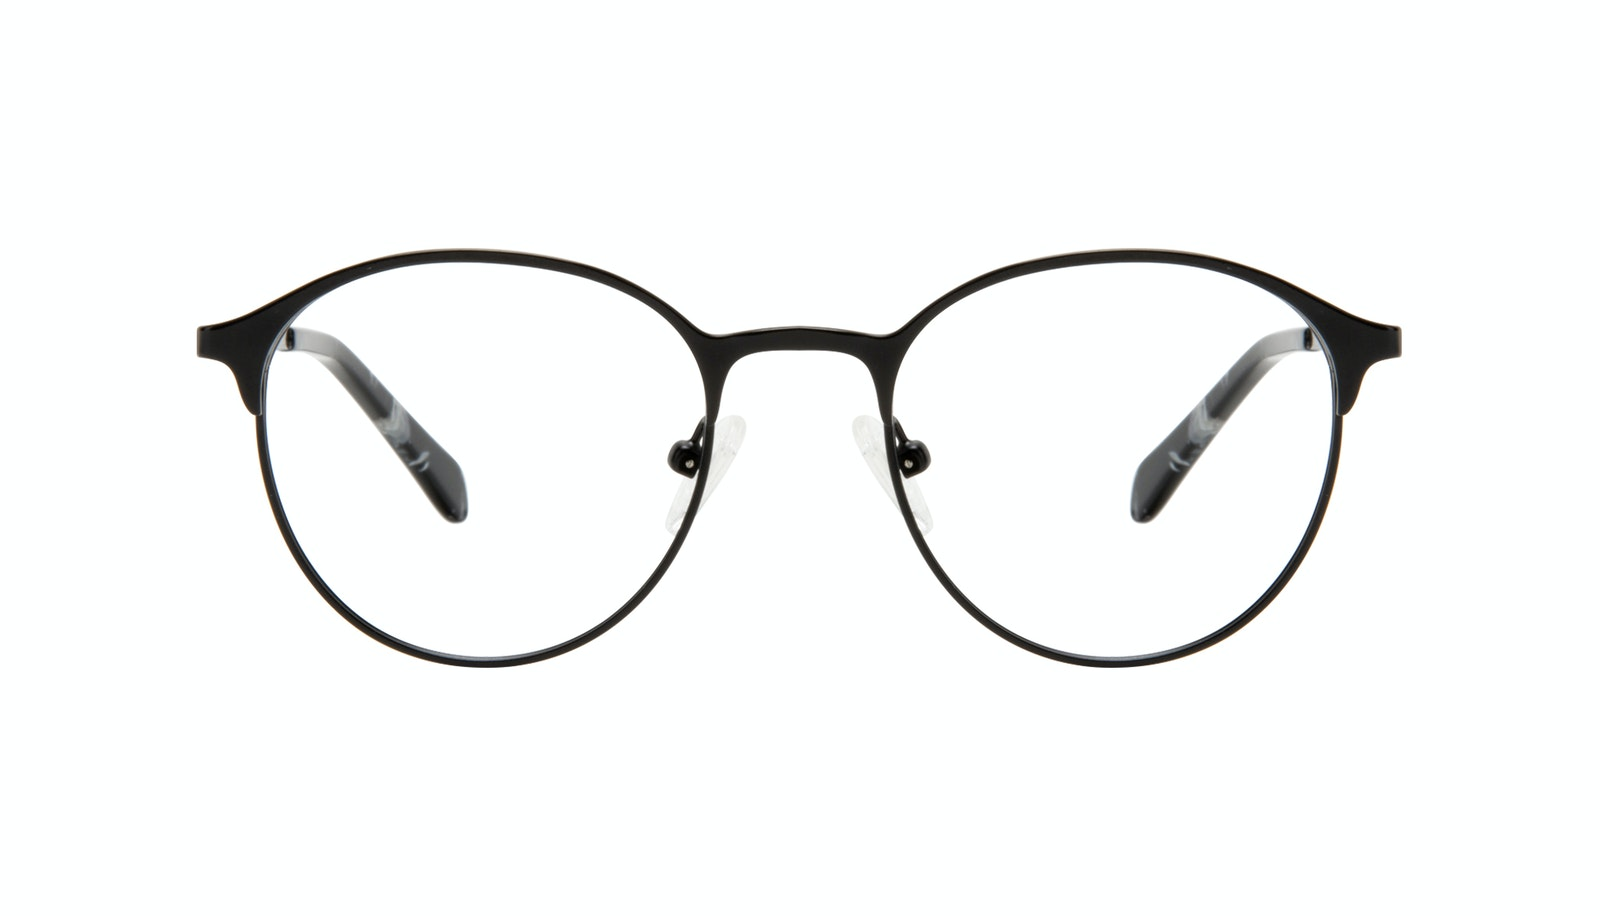 Affordable Fashion Glasses Round Eyeglasses Women Bay II Black Matte